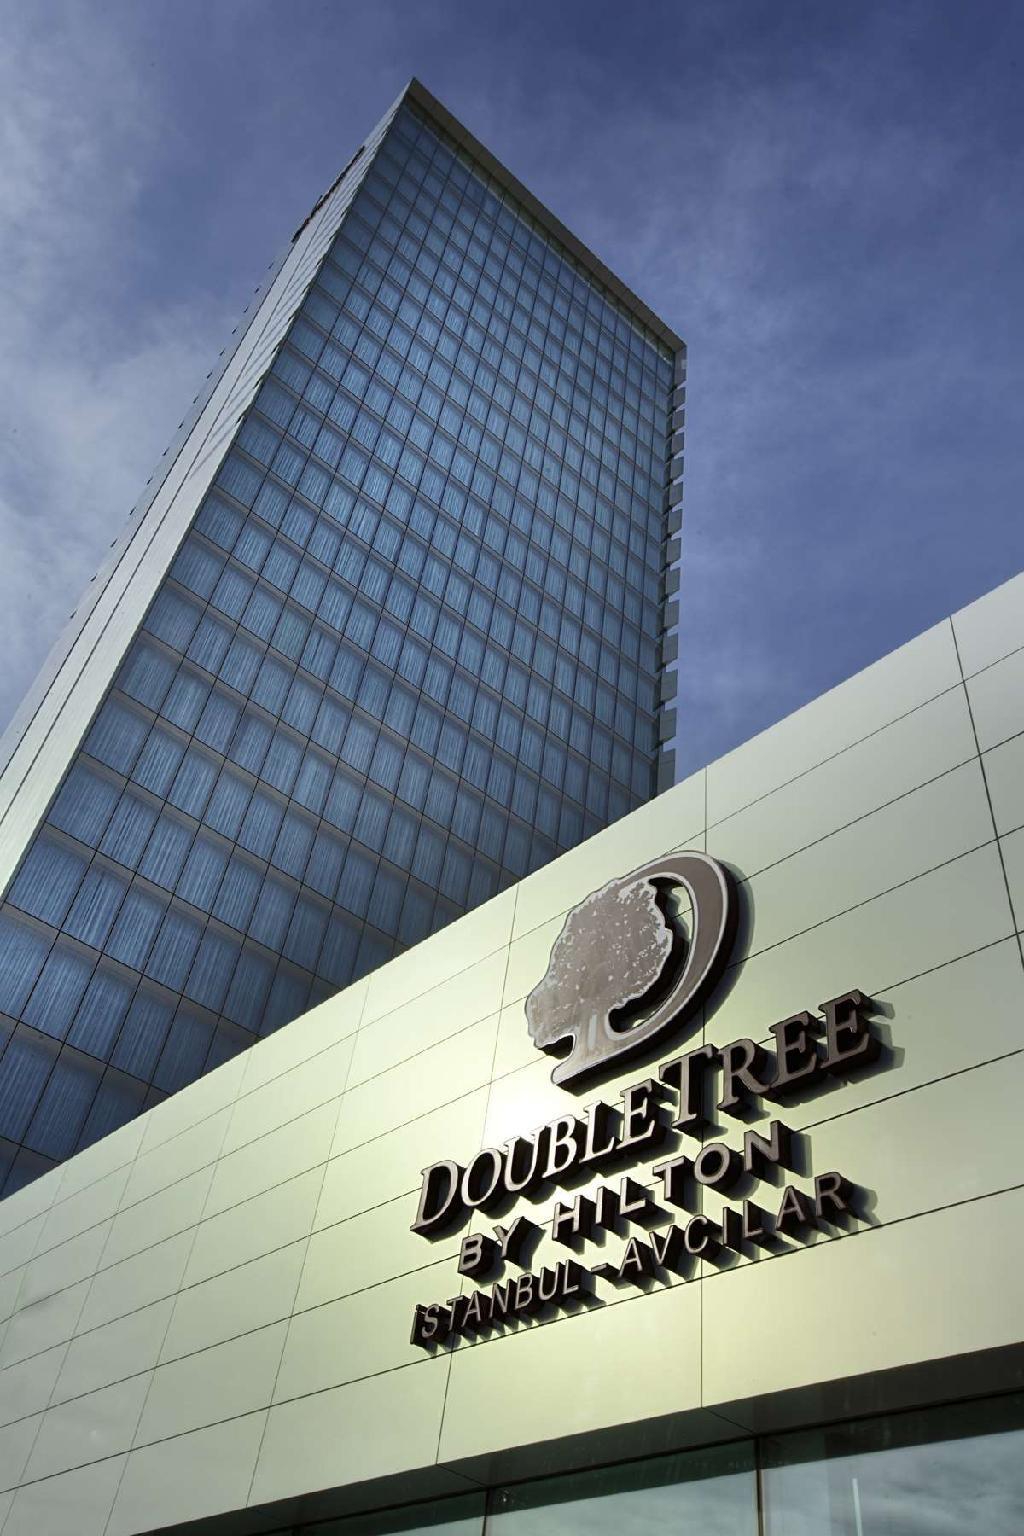 Doubletree Istanbul Avcilar Hotel, Avcılar